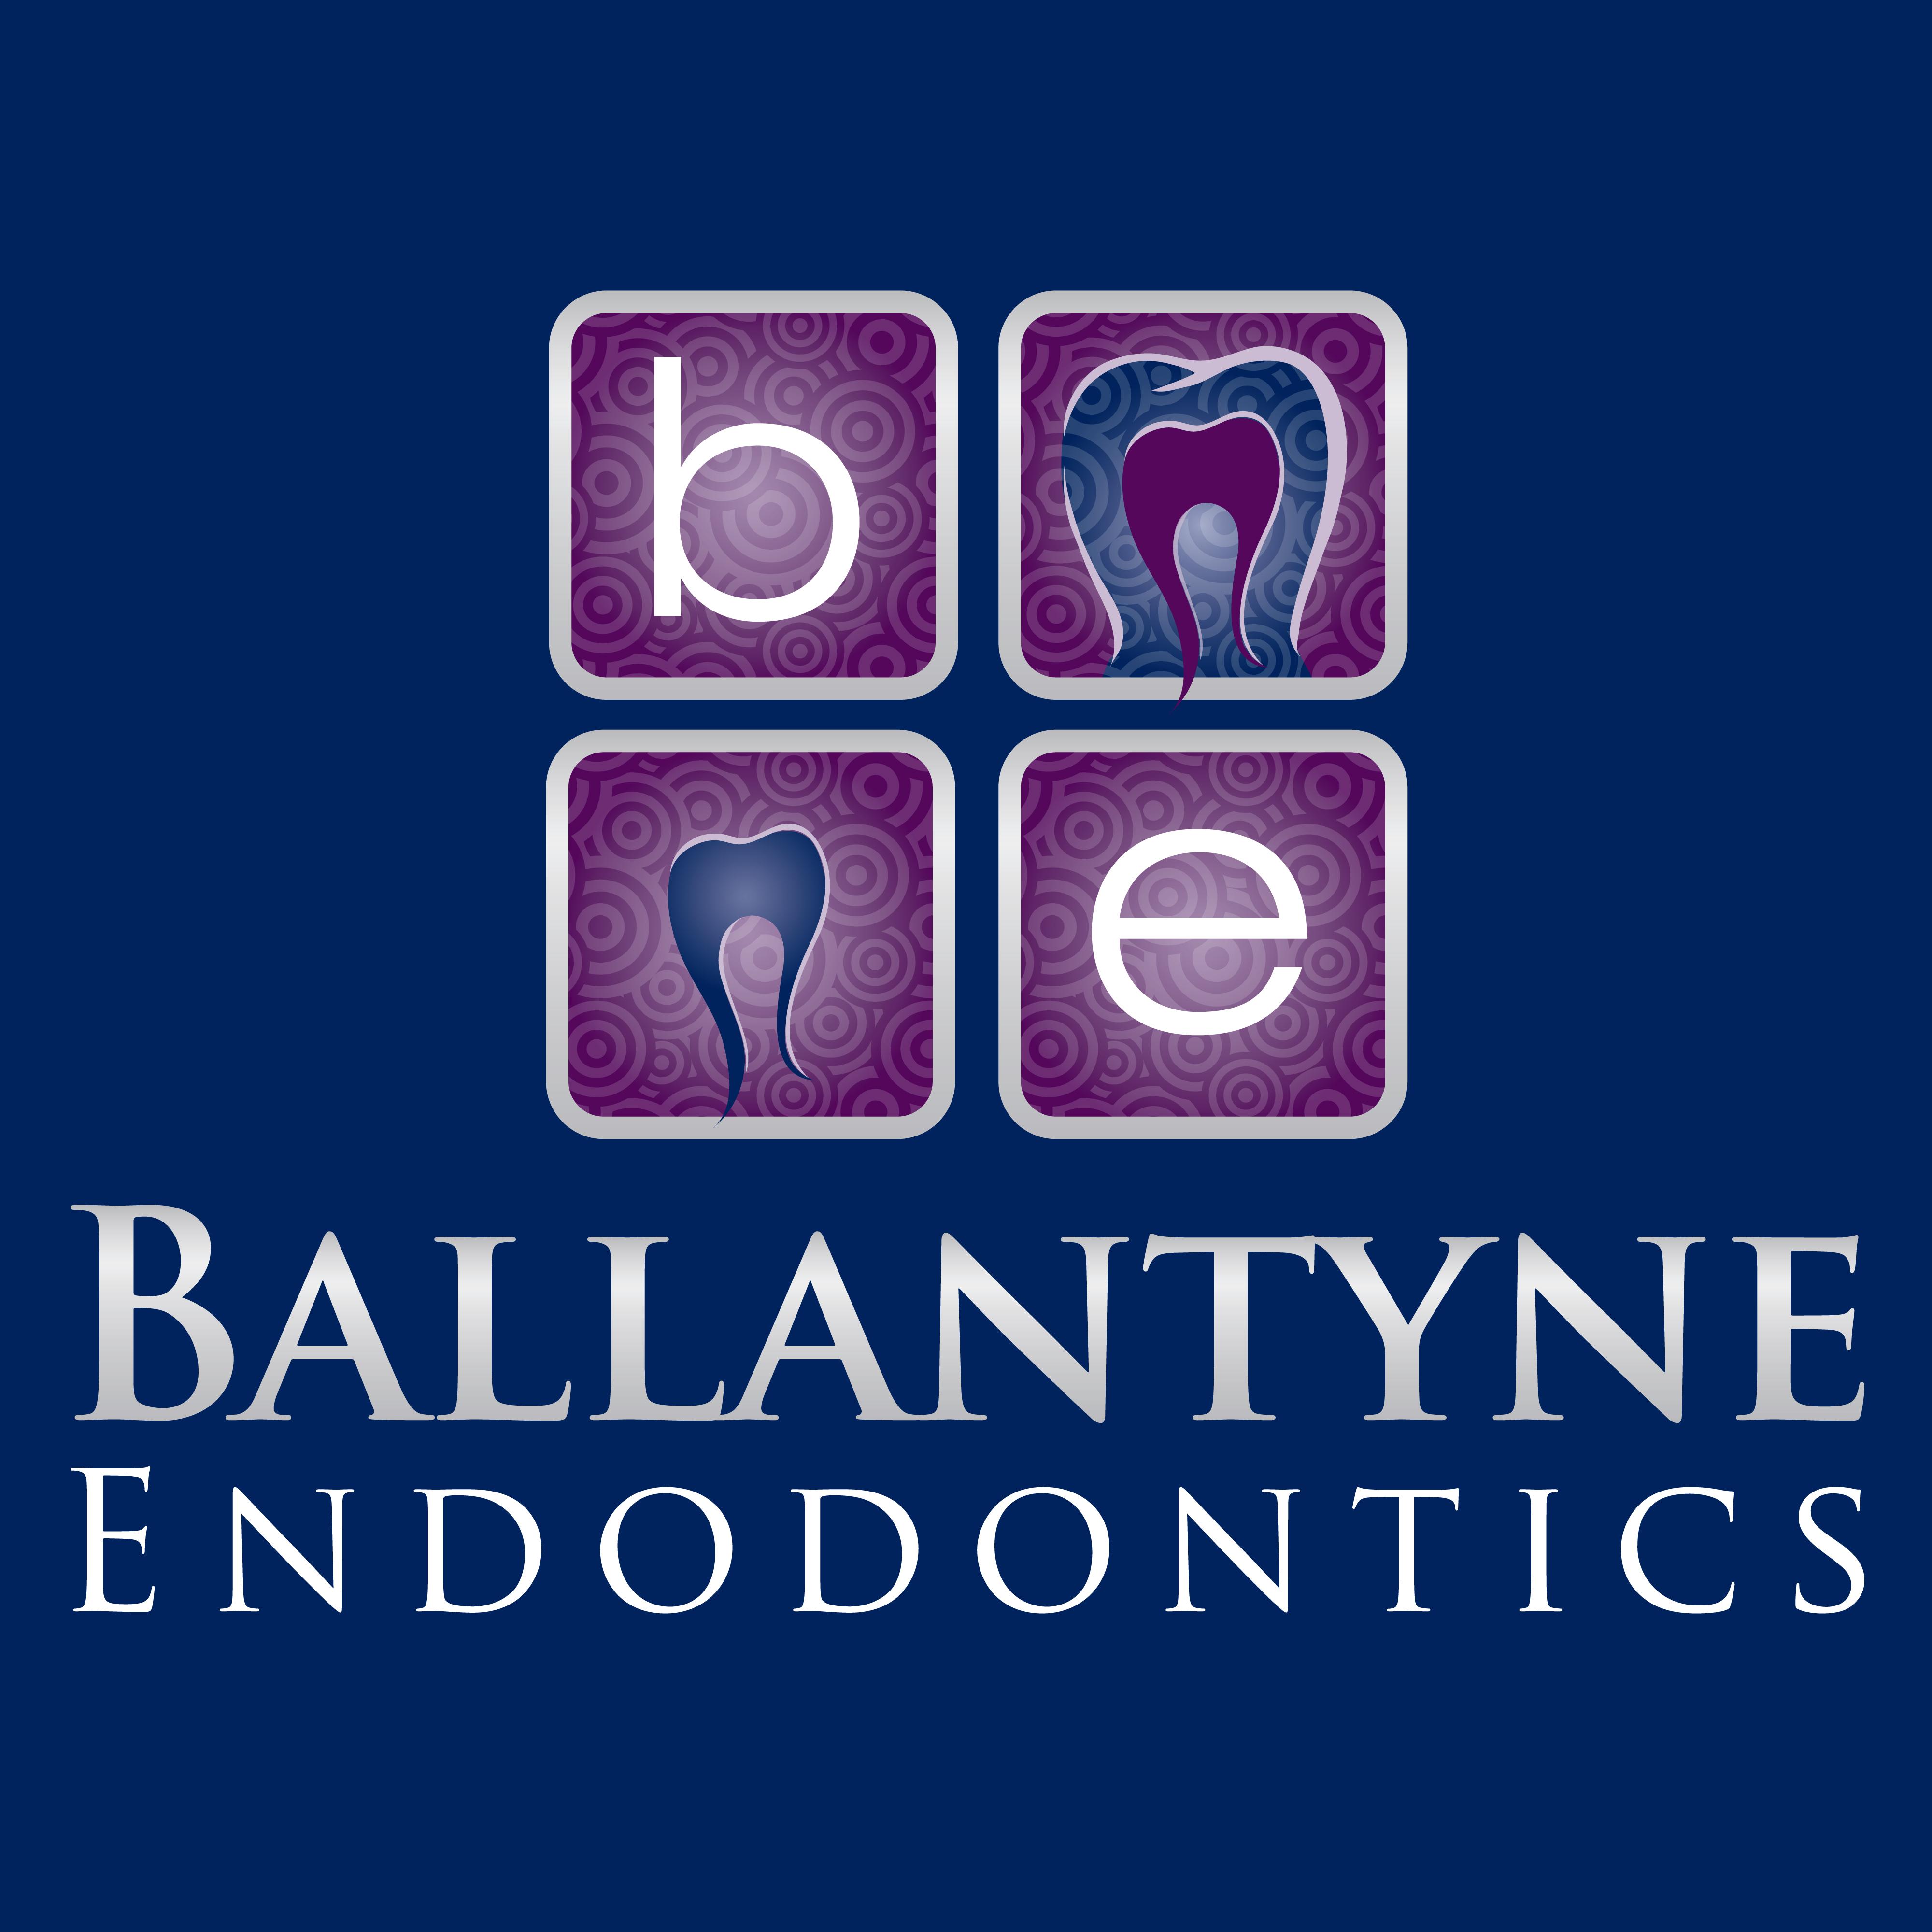 Ballantyne Endodontics